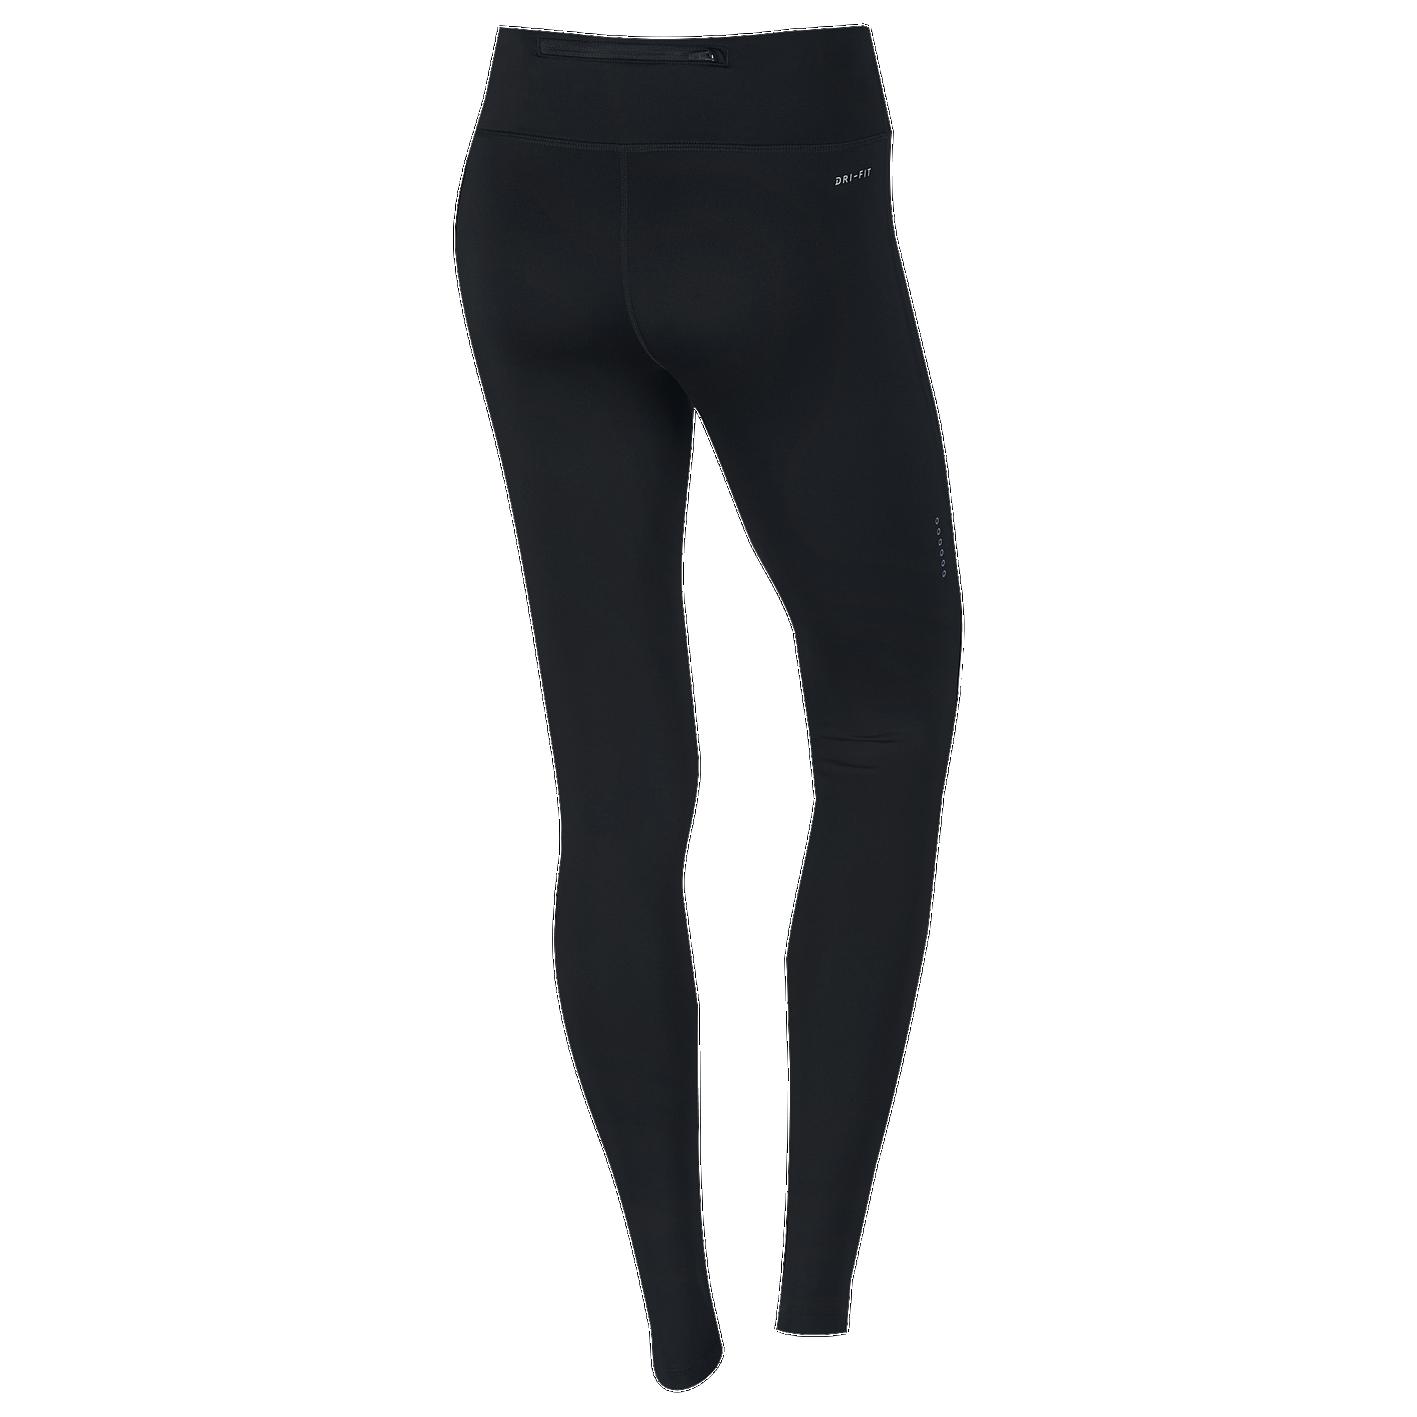 f2d98c2777d782 Nike Dri-FIT Power Essential Tights - Women's - Running - Clothing ...